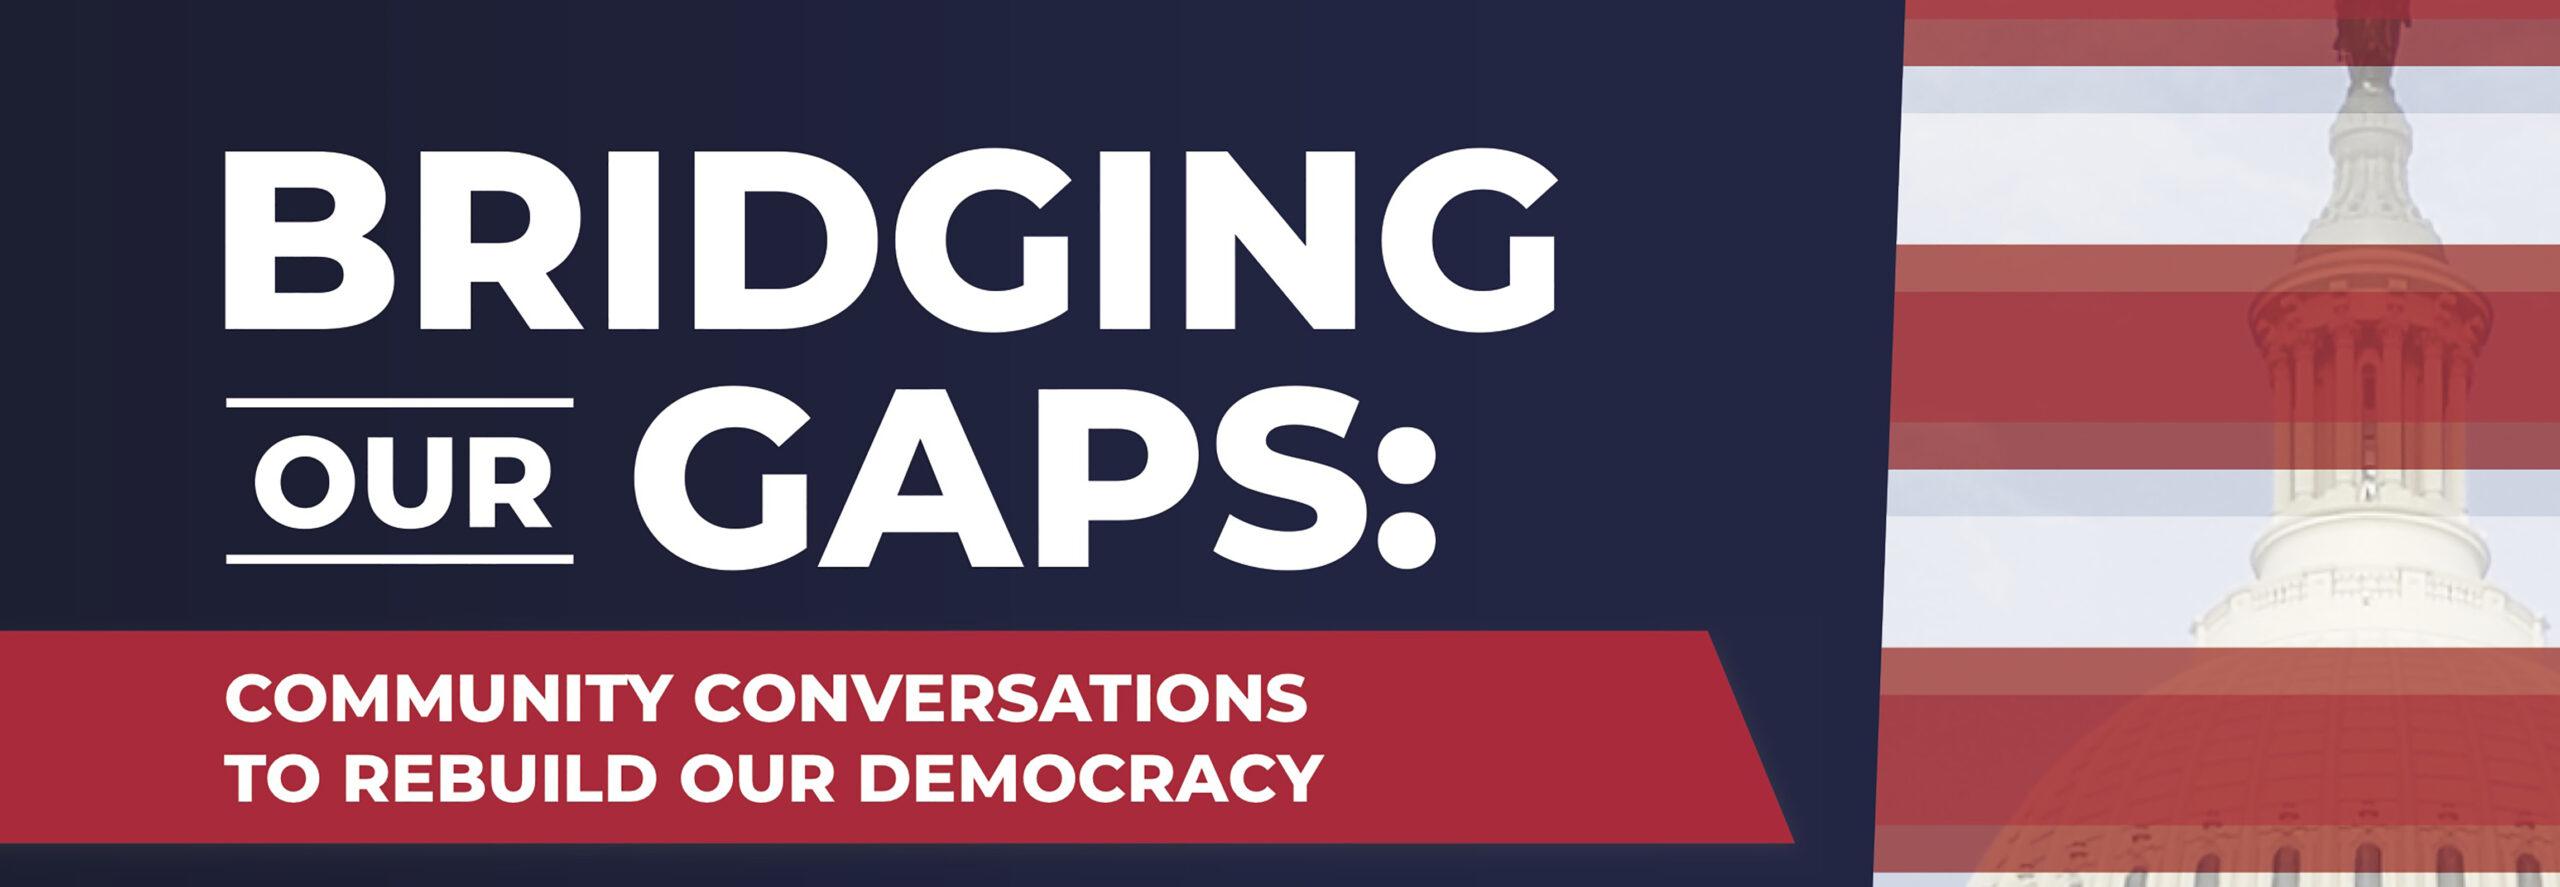 bridging-our-gaps-series-web-scaled.jpg